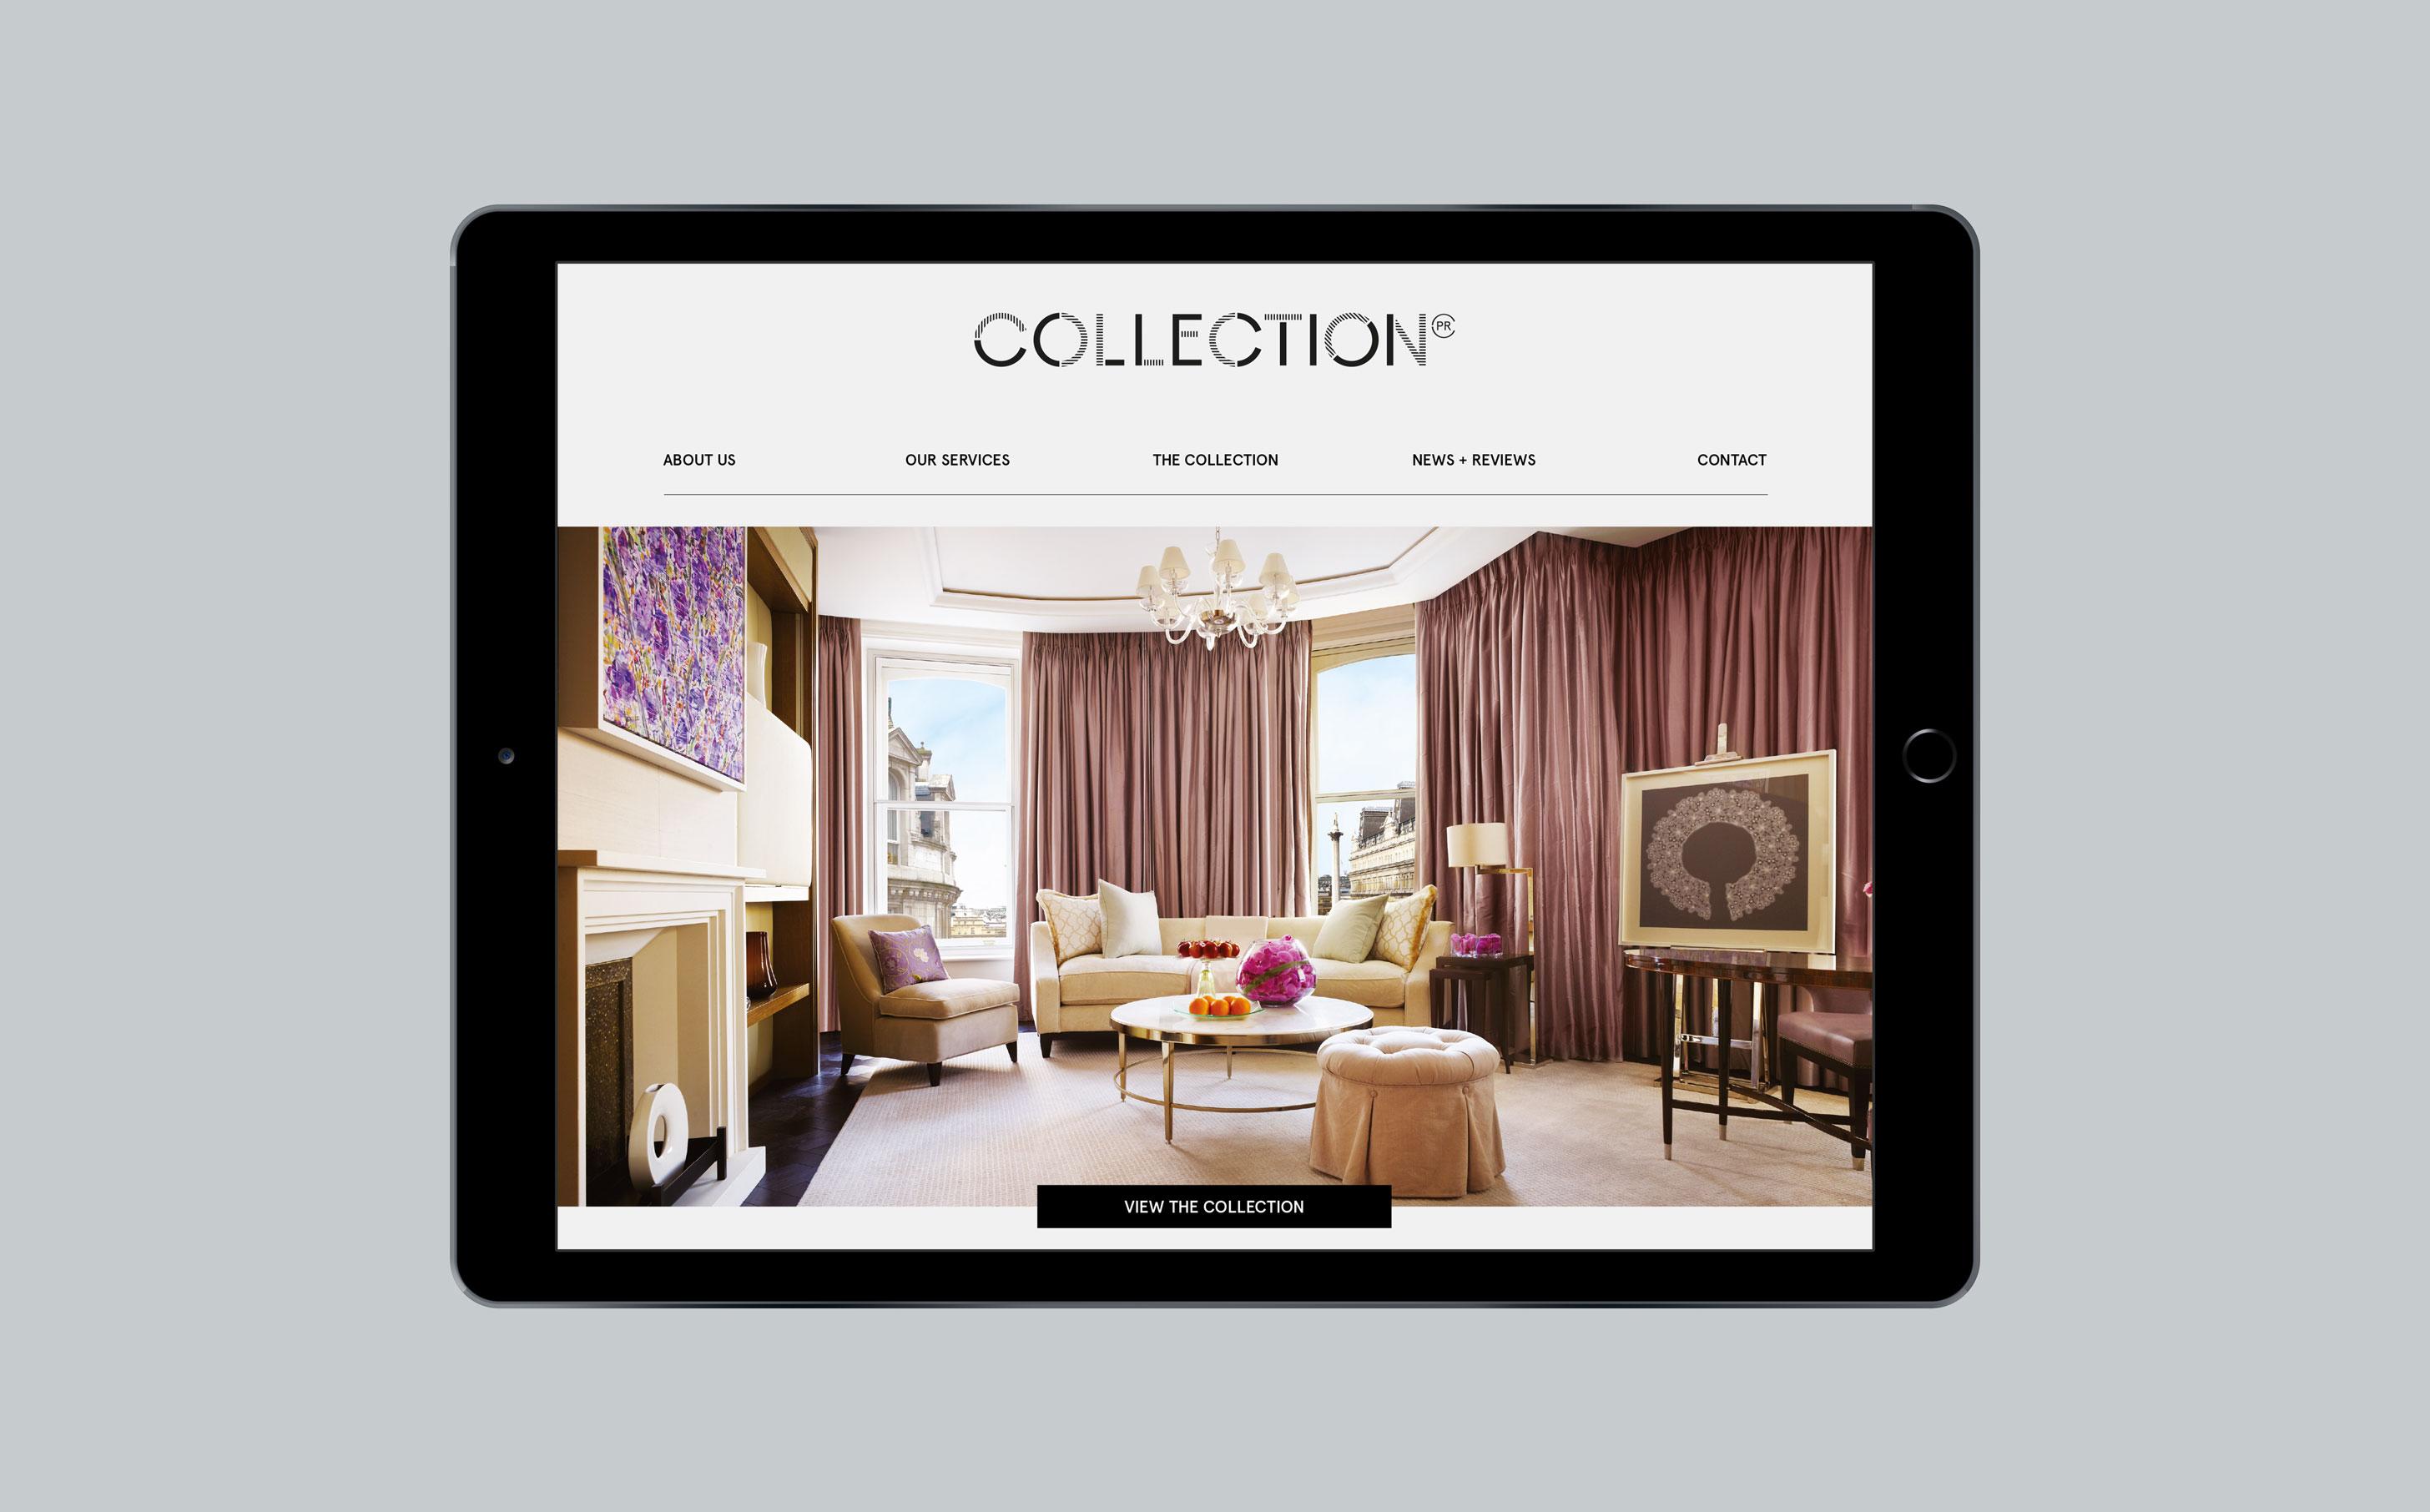 website-design-collection-pr-ipad